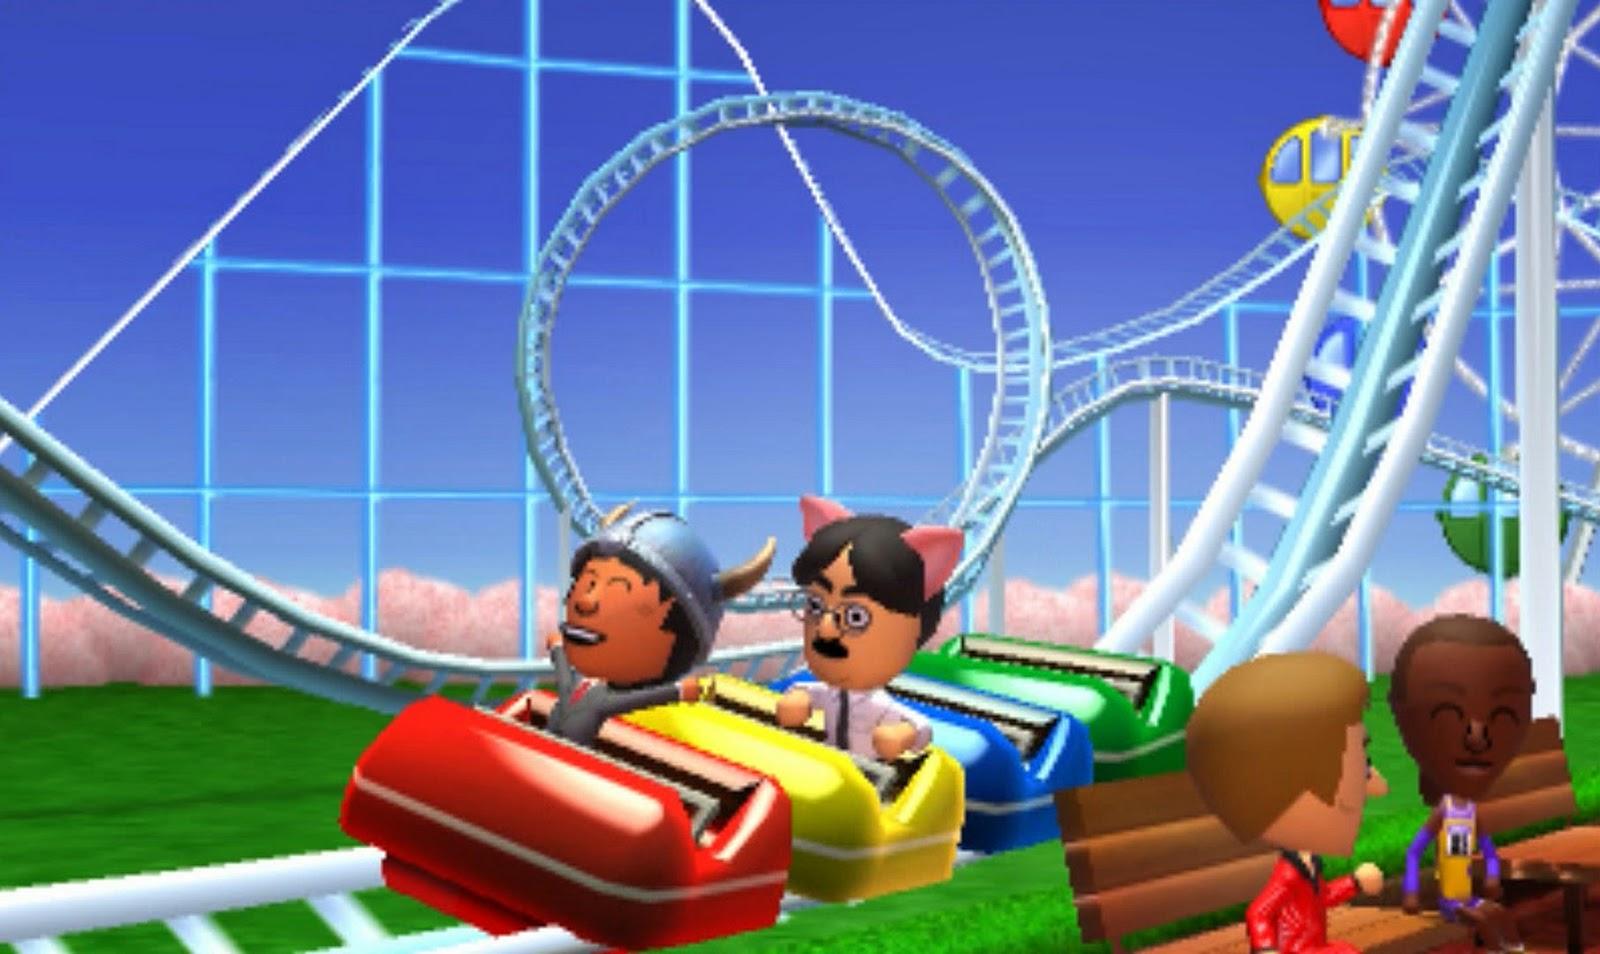 Daisy Mii Qr Code Tomodachi Life: It's A Wonderful Rife: No Homosexuals In Nintendo